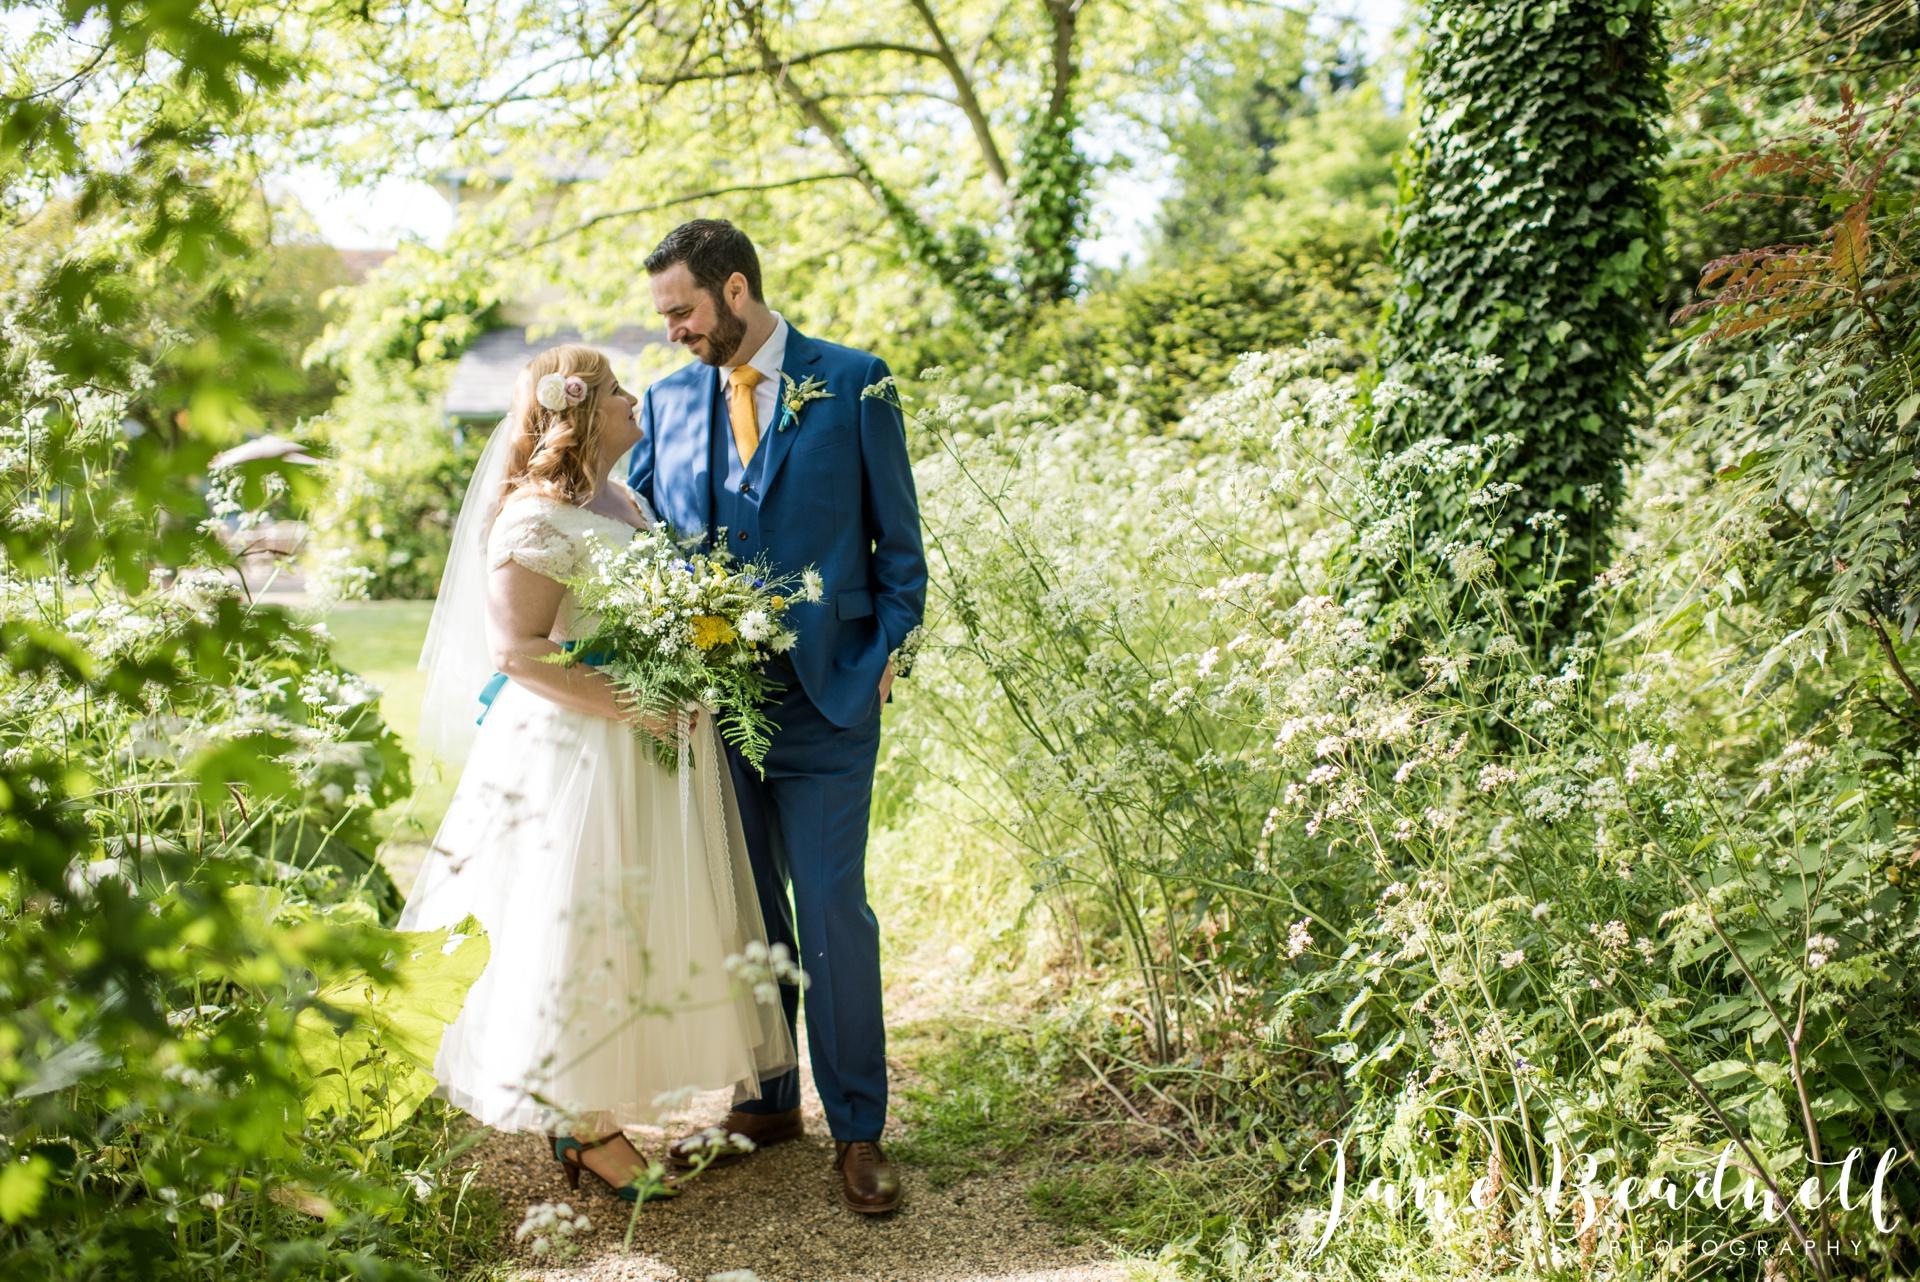 South Farm Wedding photography Hertfordshire by Jane Beadnell Photography fine art wedding photographer_0103